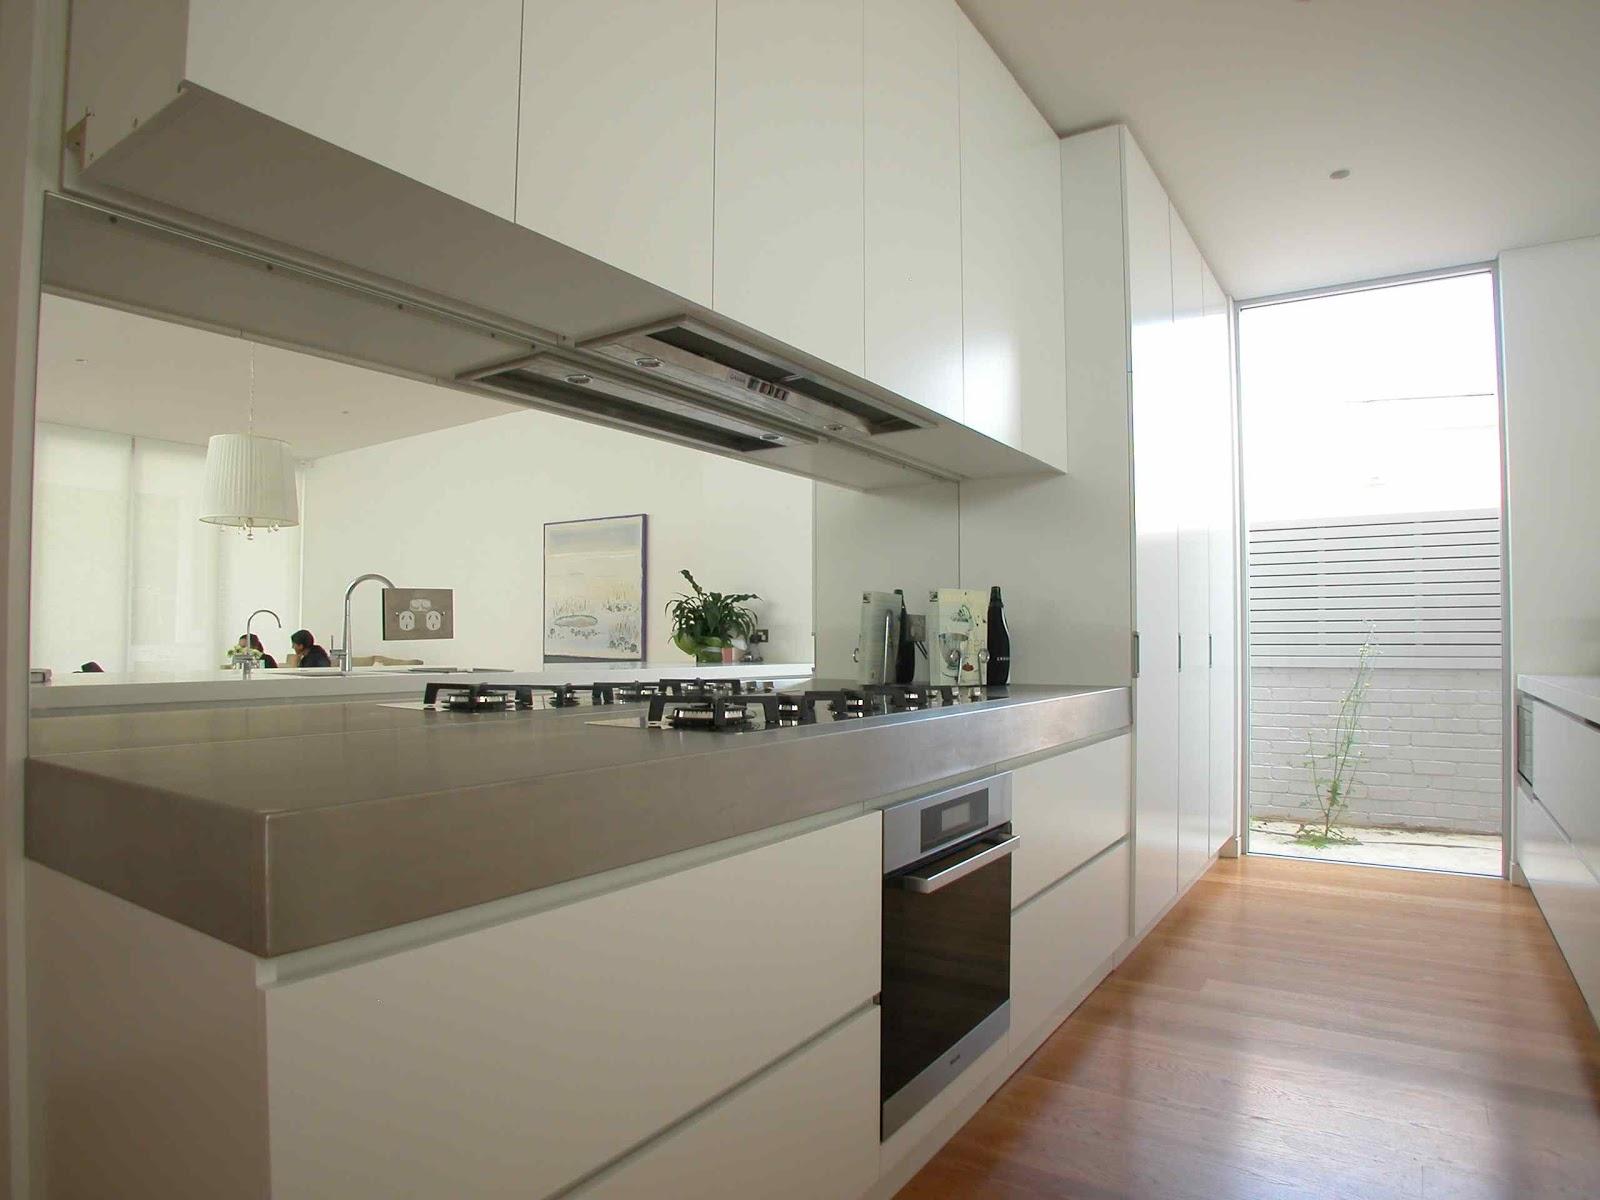 minosa minosa kitchen all white fresh style. Black Bedroom Furniture Sets. Home Design Ideas